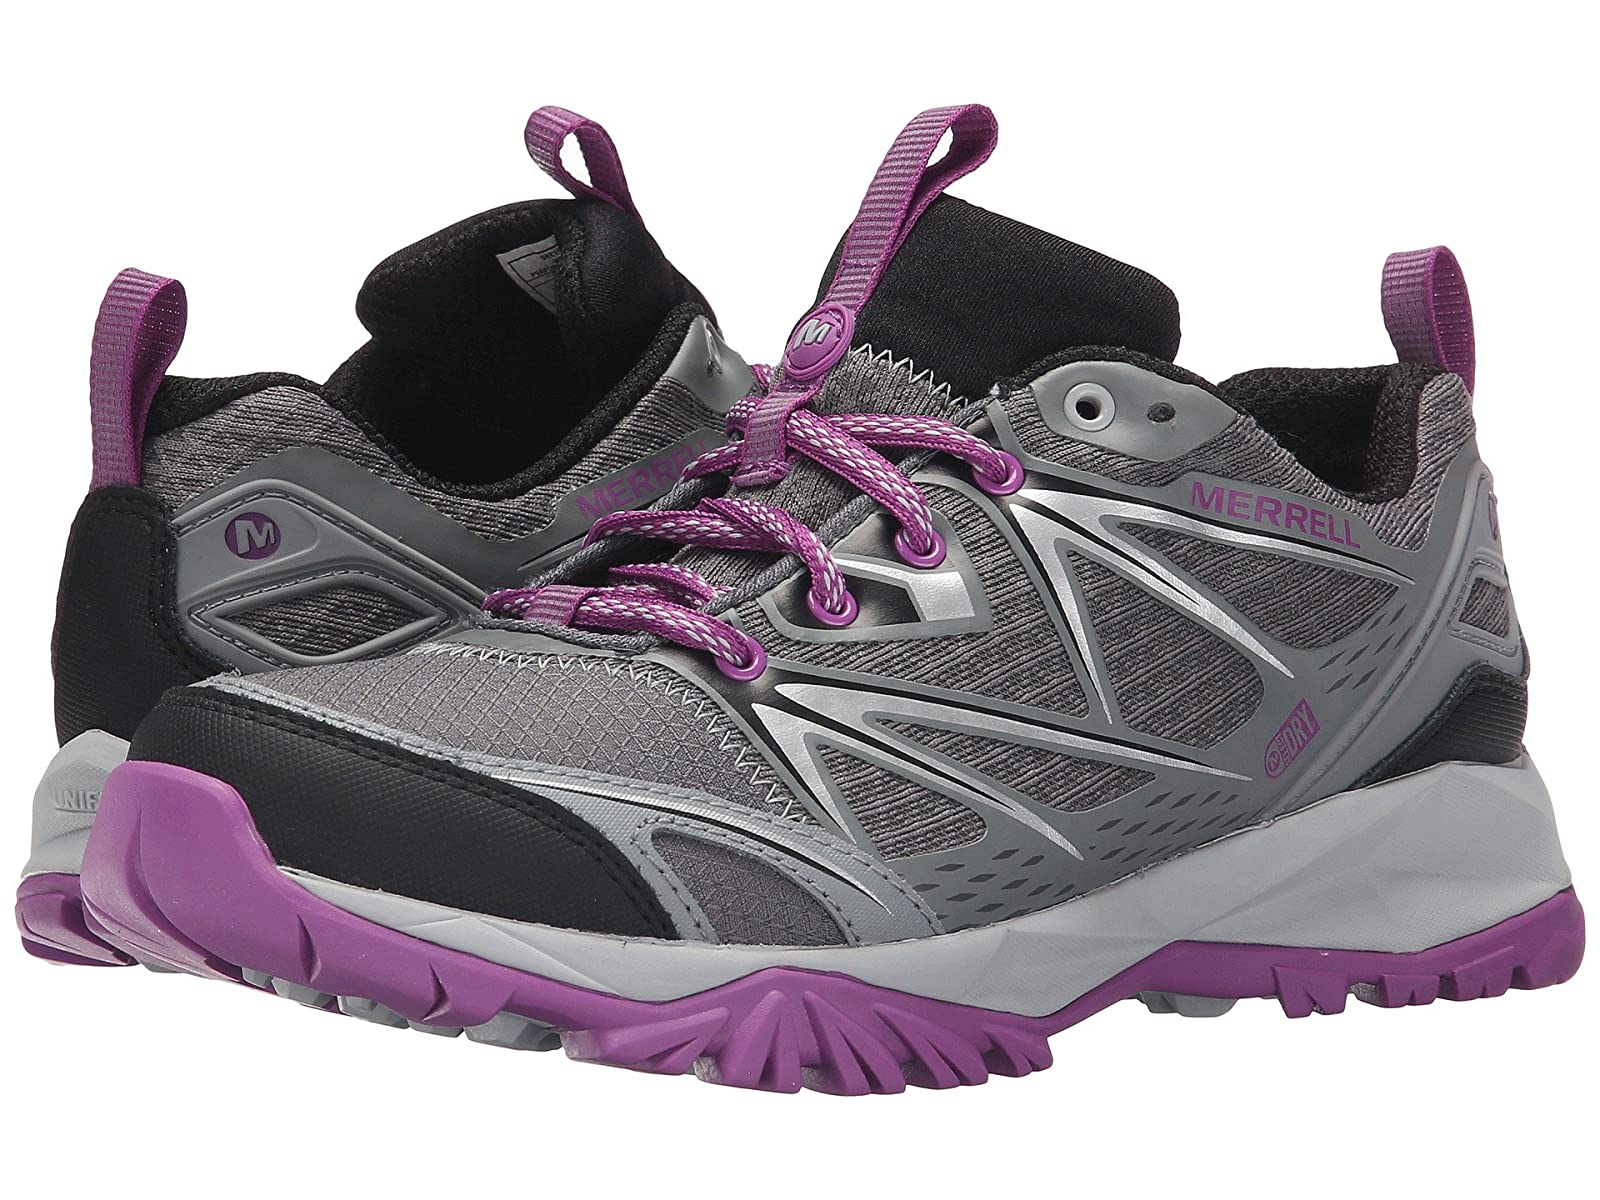 Merrell Capra Bolt WaterproofCheap and distinctive eye-catching shoes